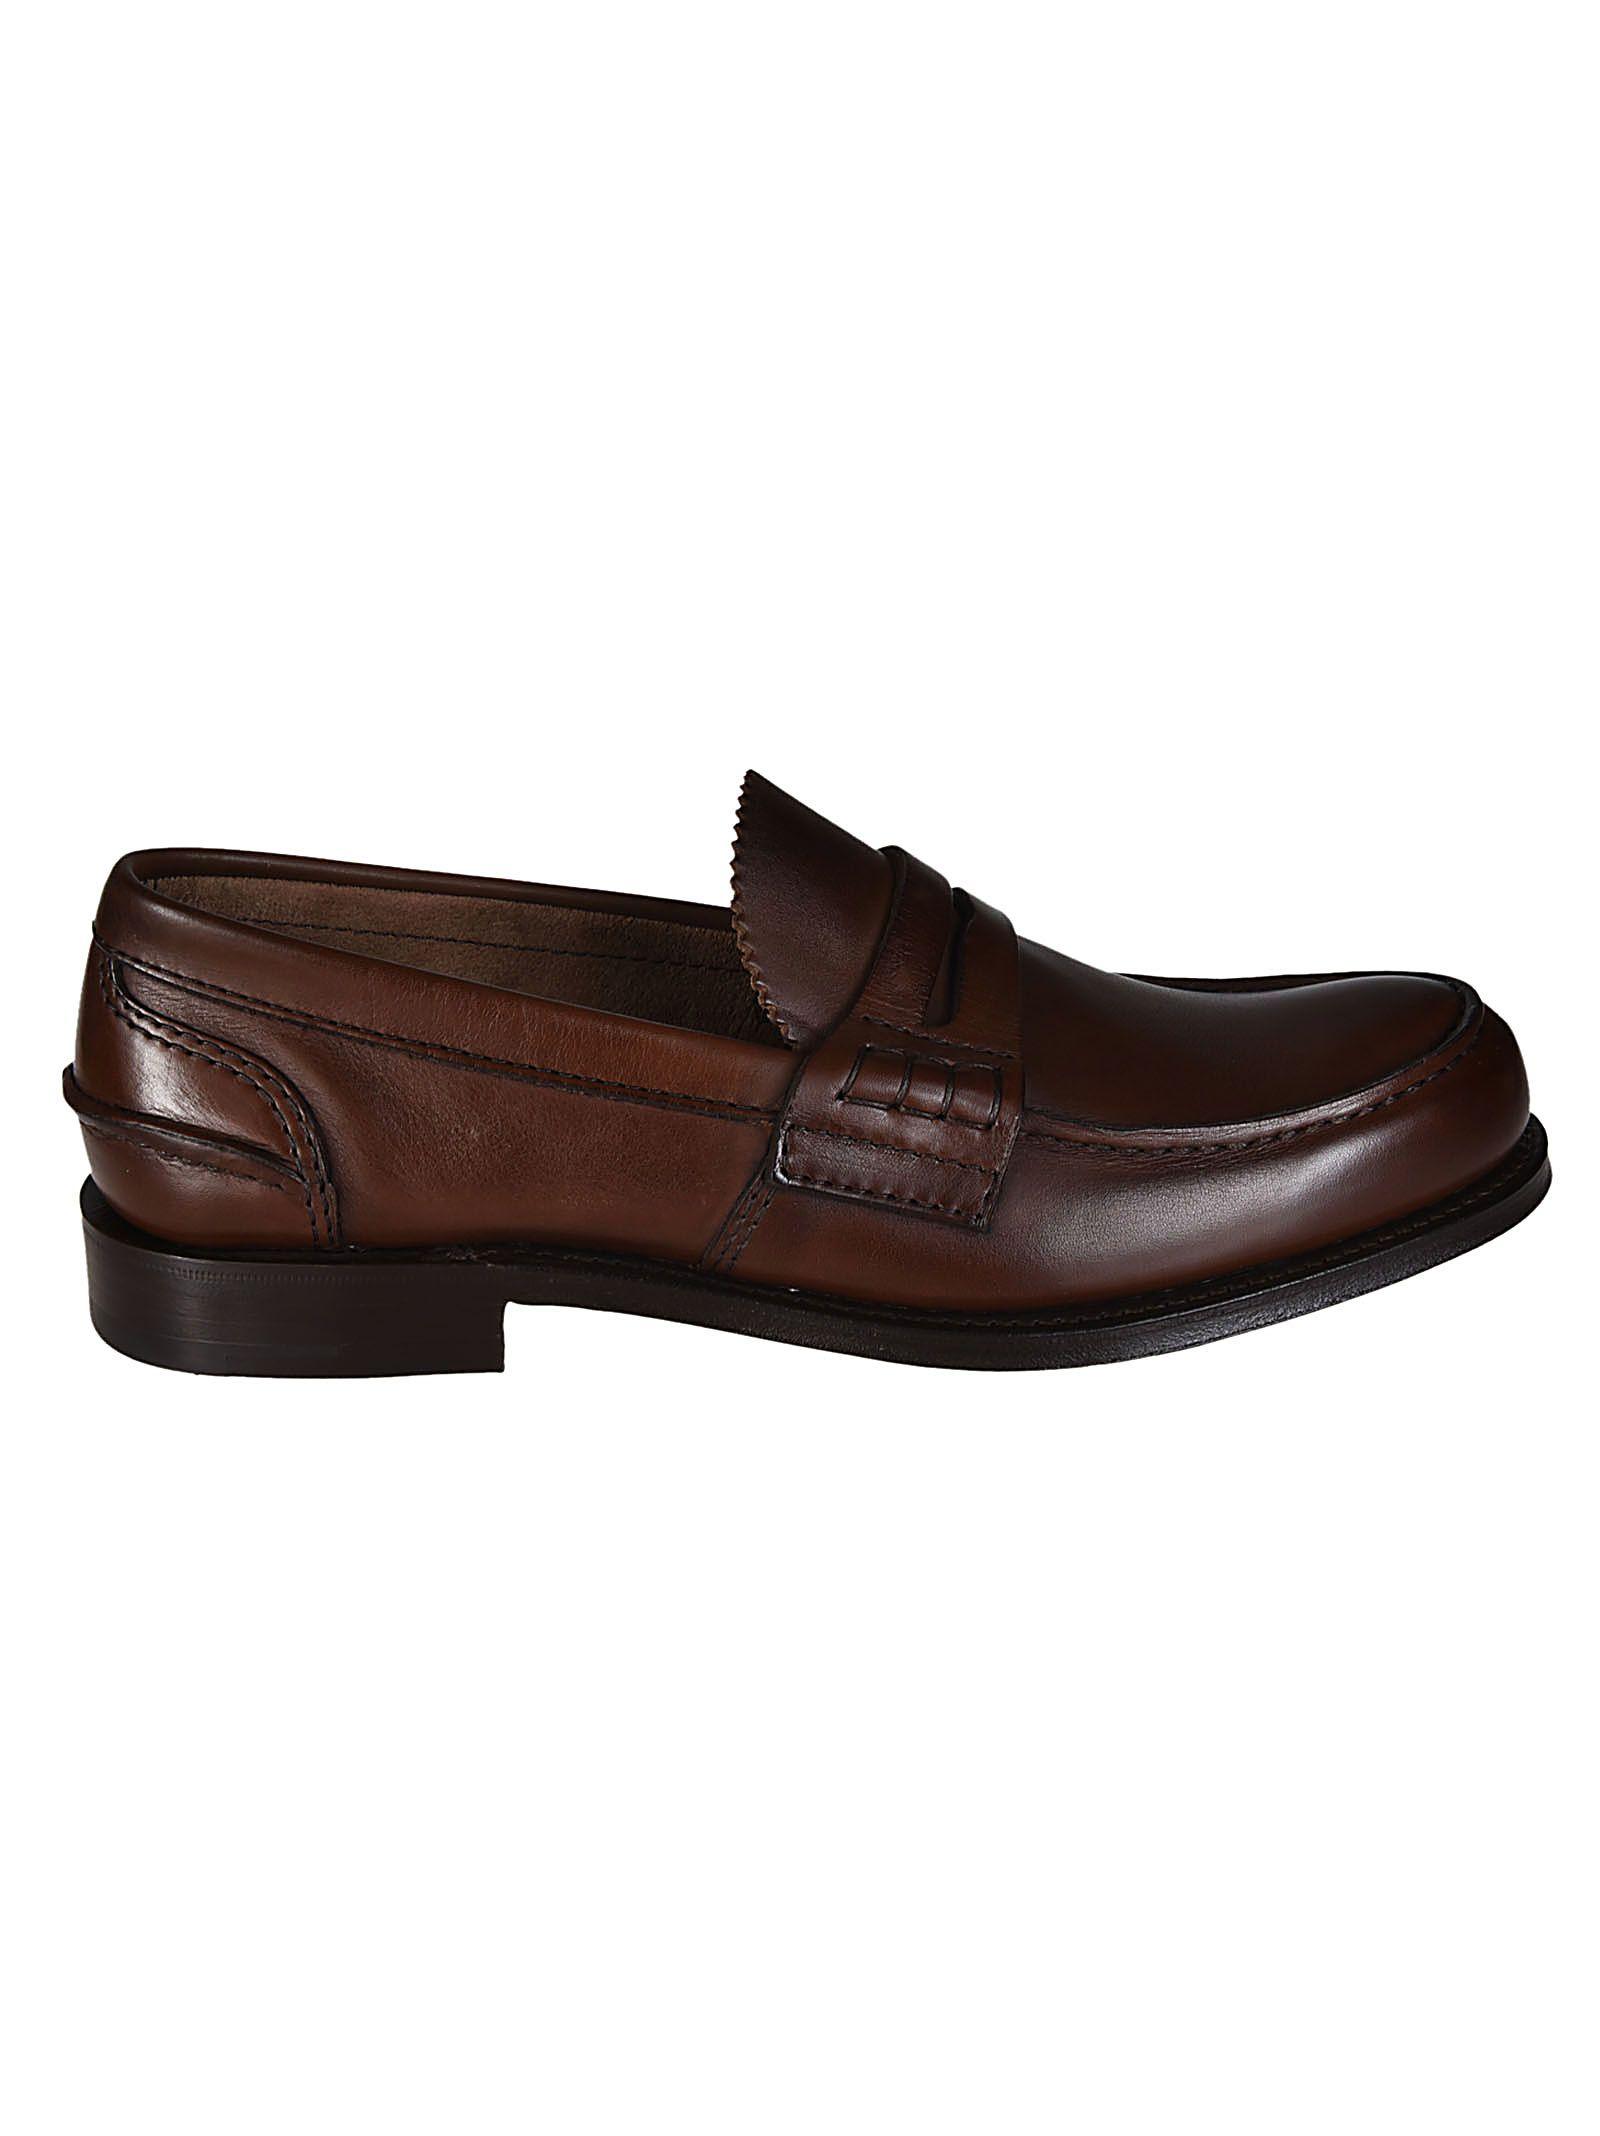 Churchs Tunbridge Loafers